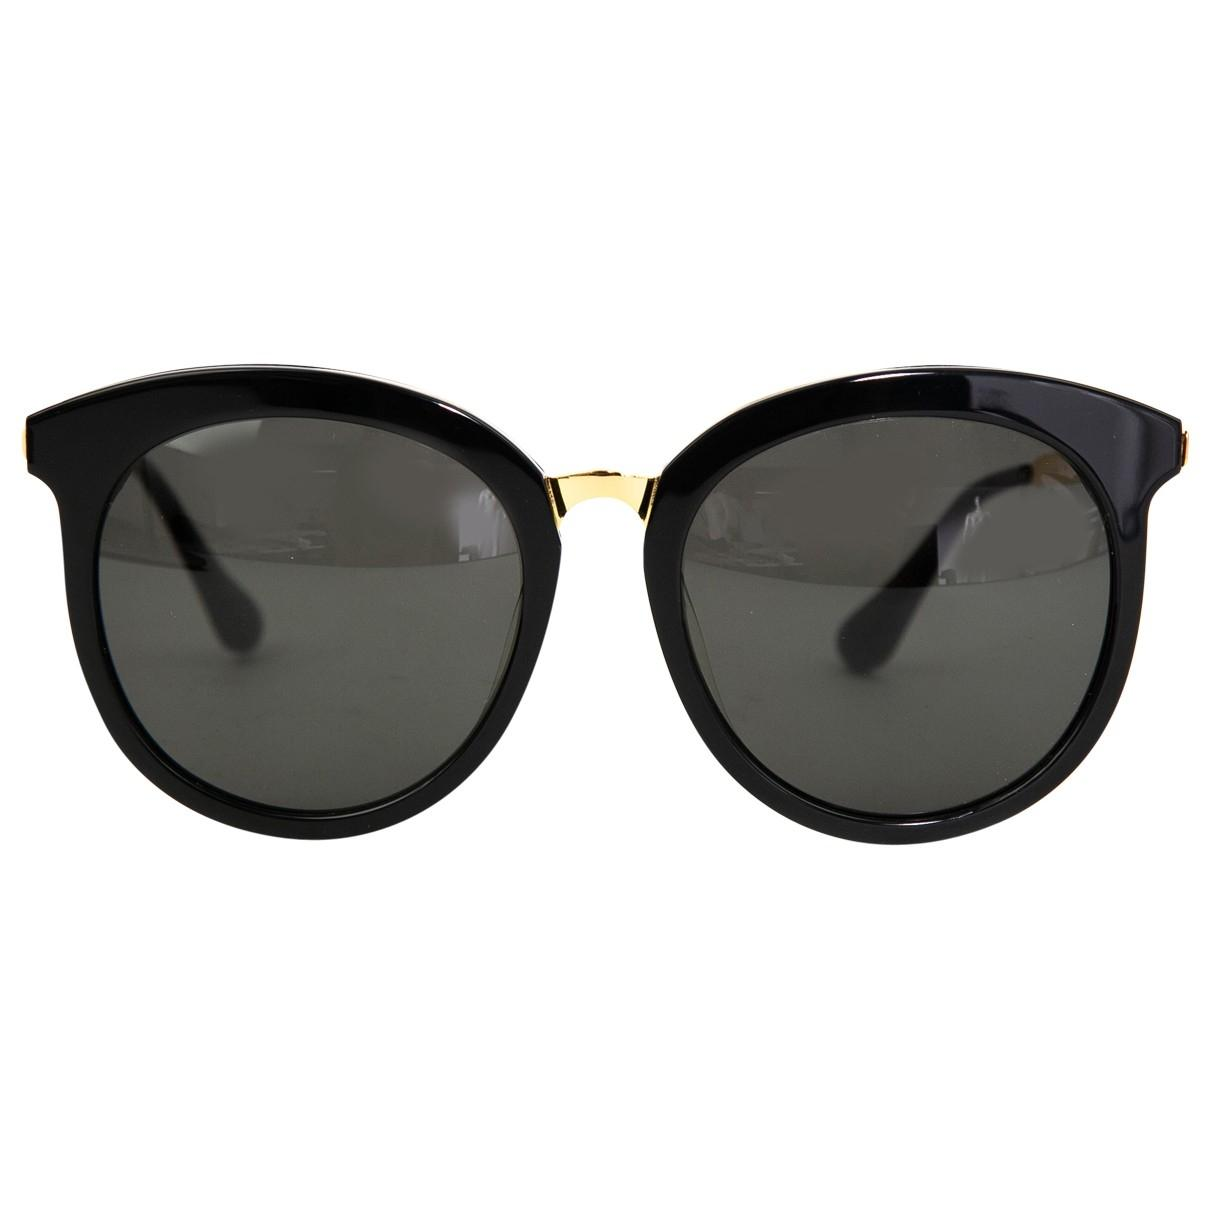 39eabc52b5edf Lyst - Gentle Monster Pre-owned Black Plastic Sunglasses in Black